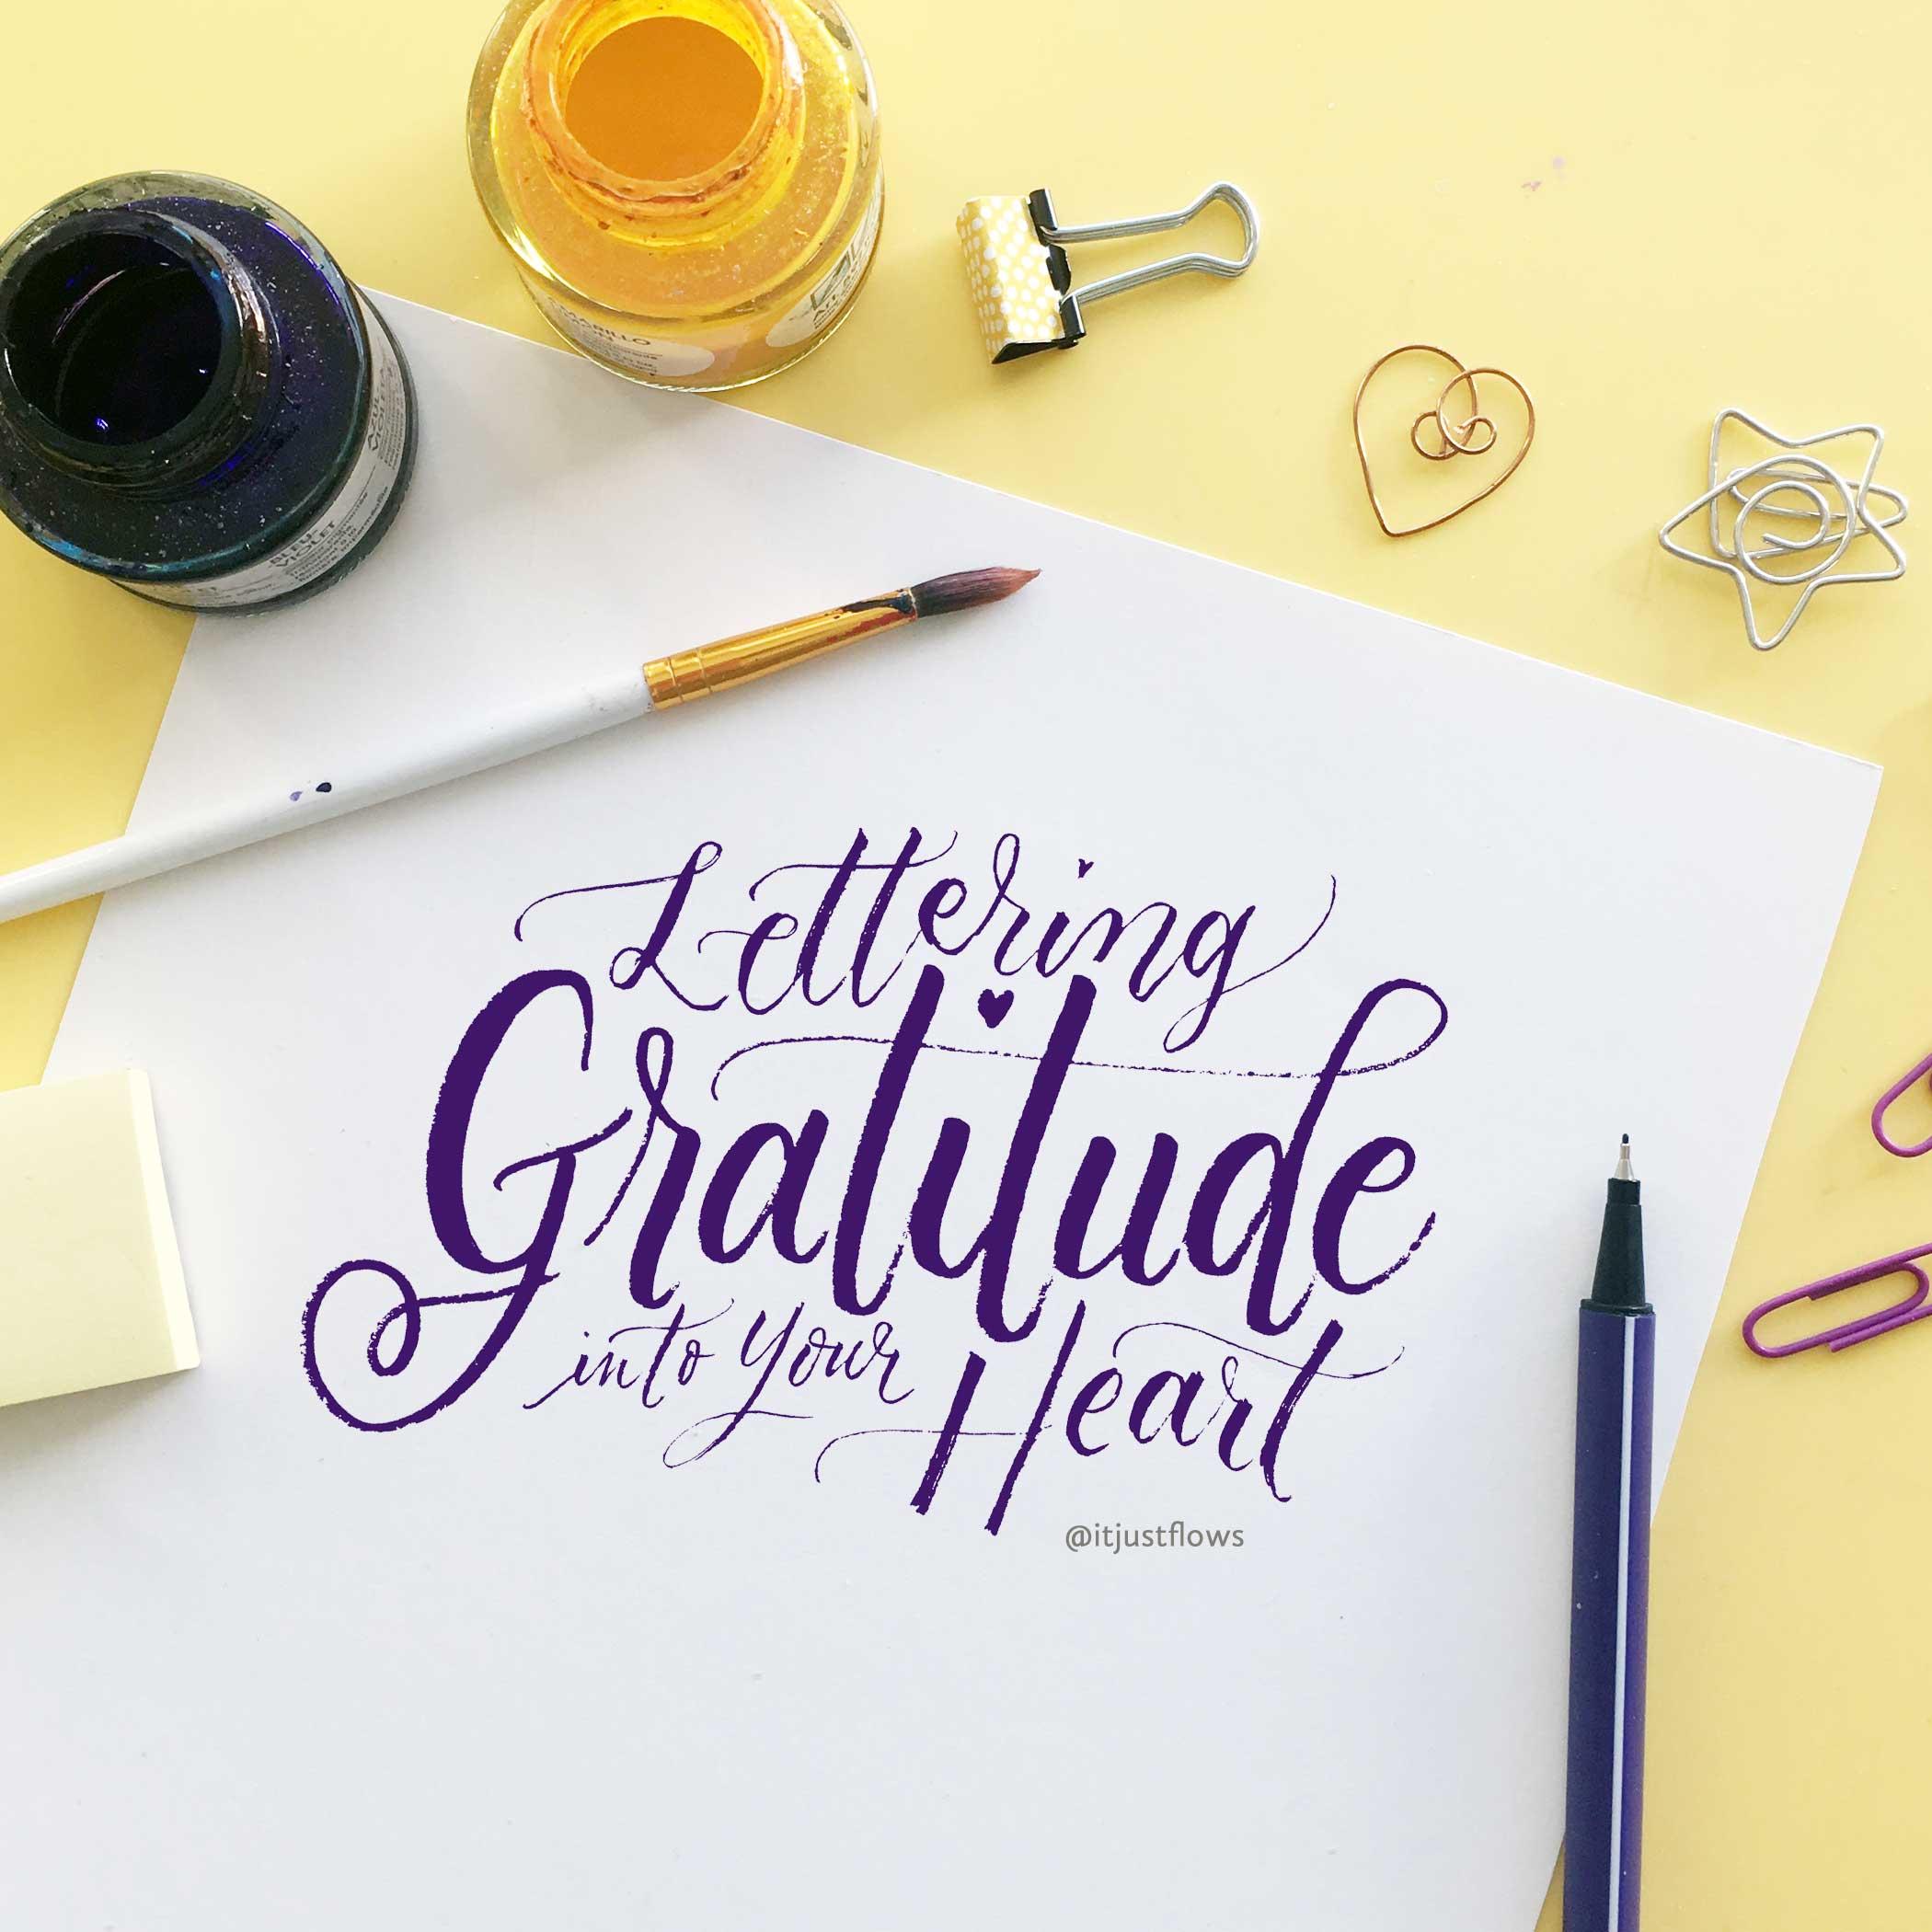 sq-yellow-2-GRATITUDE-purple-calligraphy-itjustflows-web.jpg